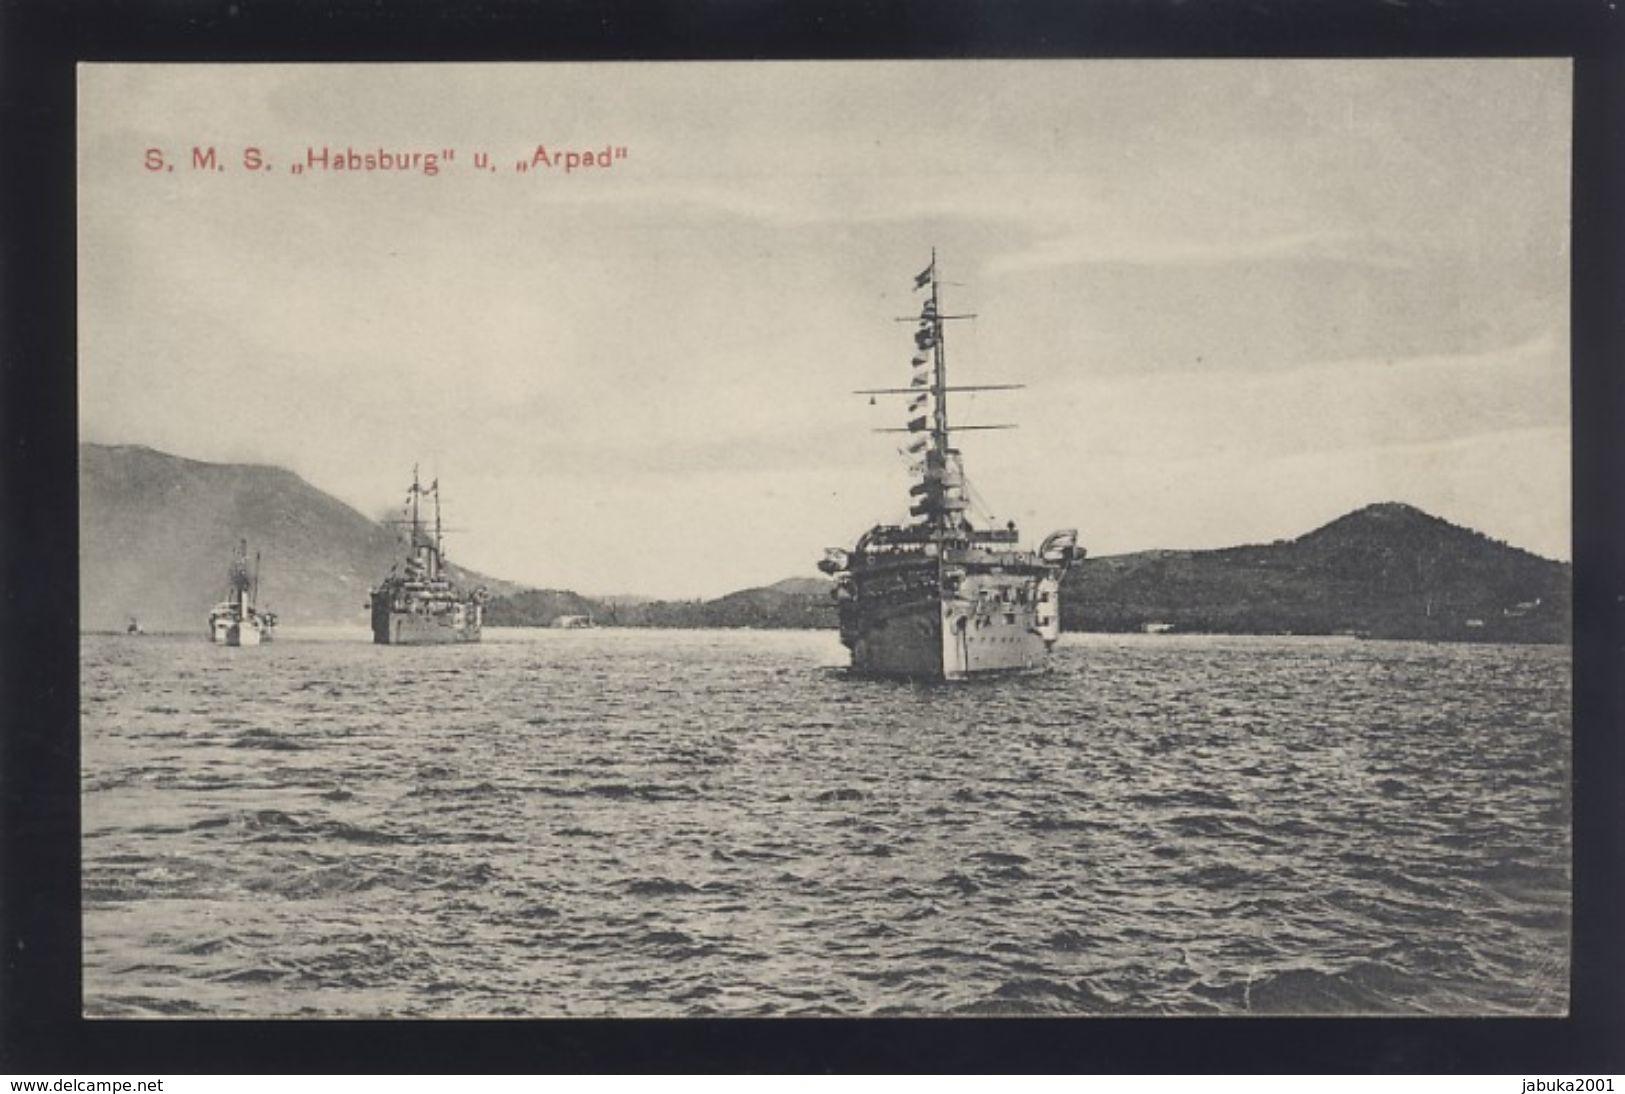 CROATIA POLA AUSTRIA WAR SHIP SCHIFFE S.M.S. HABSBURG & ARPAD OLD PC #79 - Warships